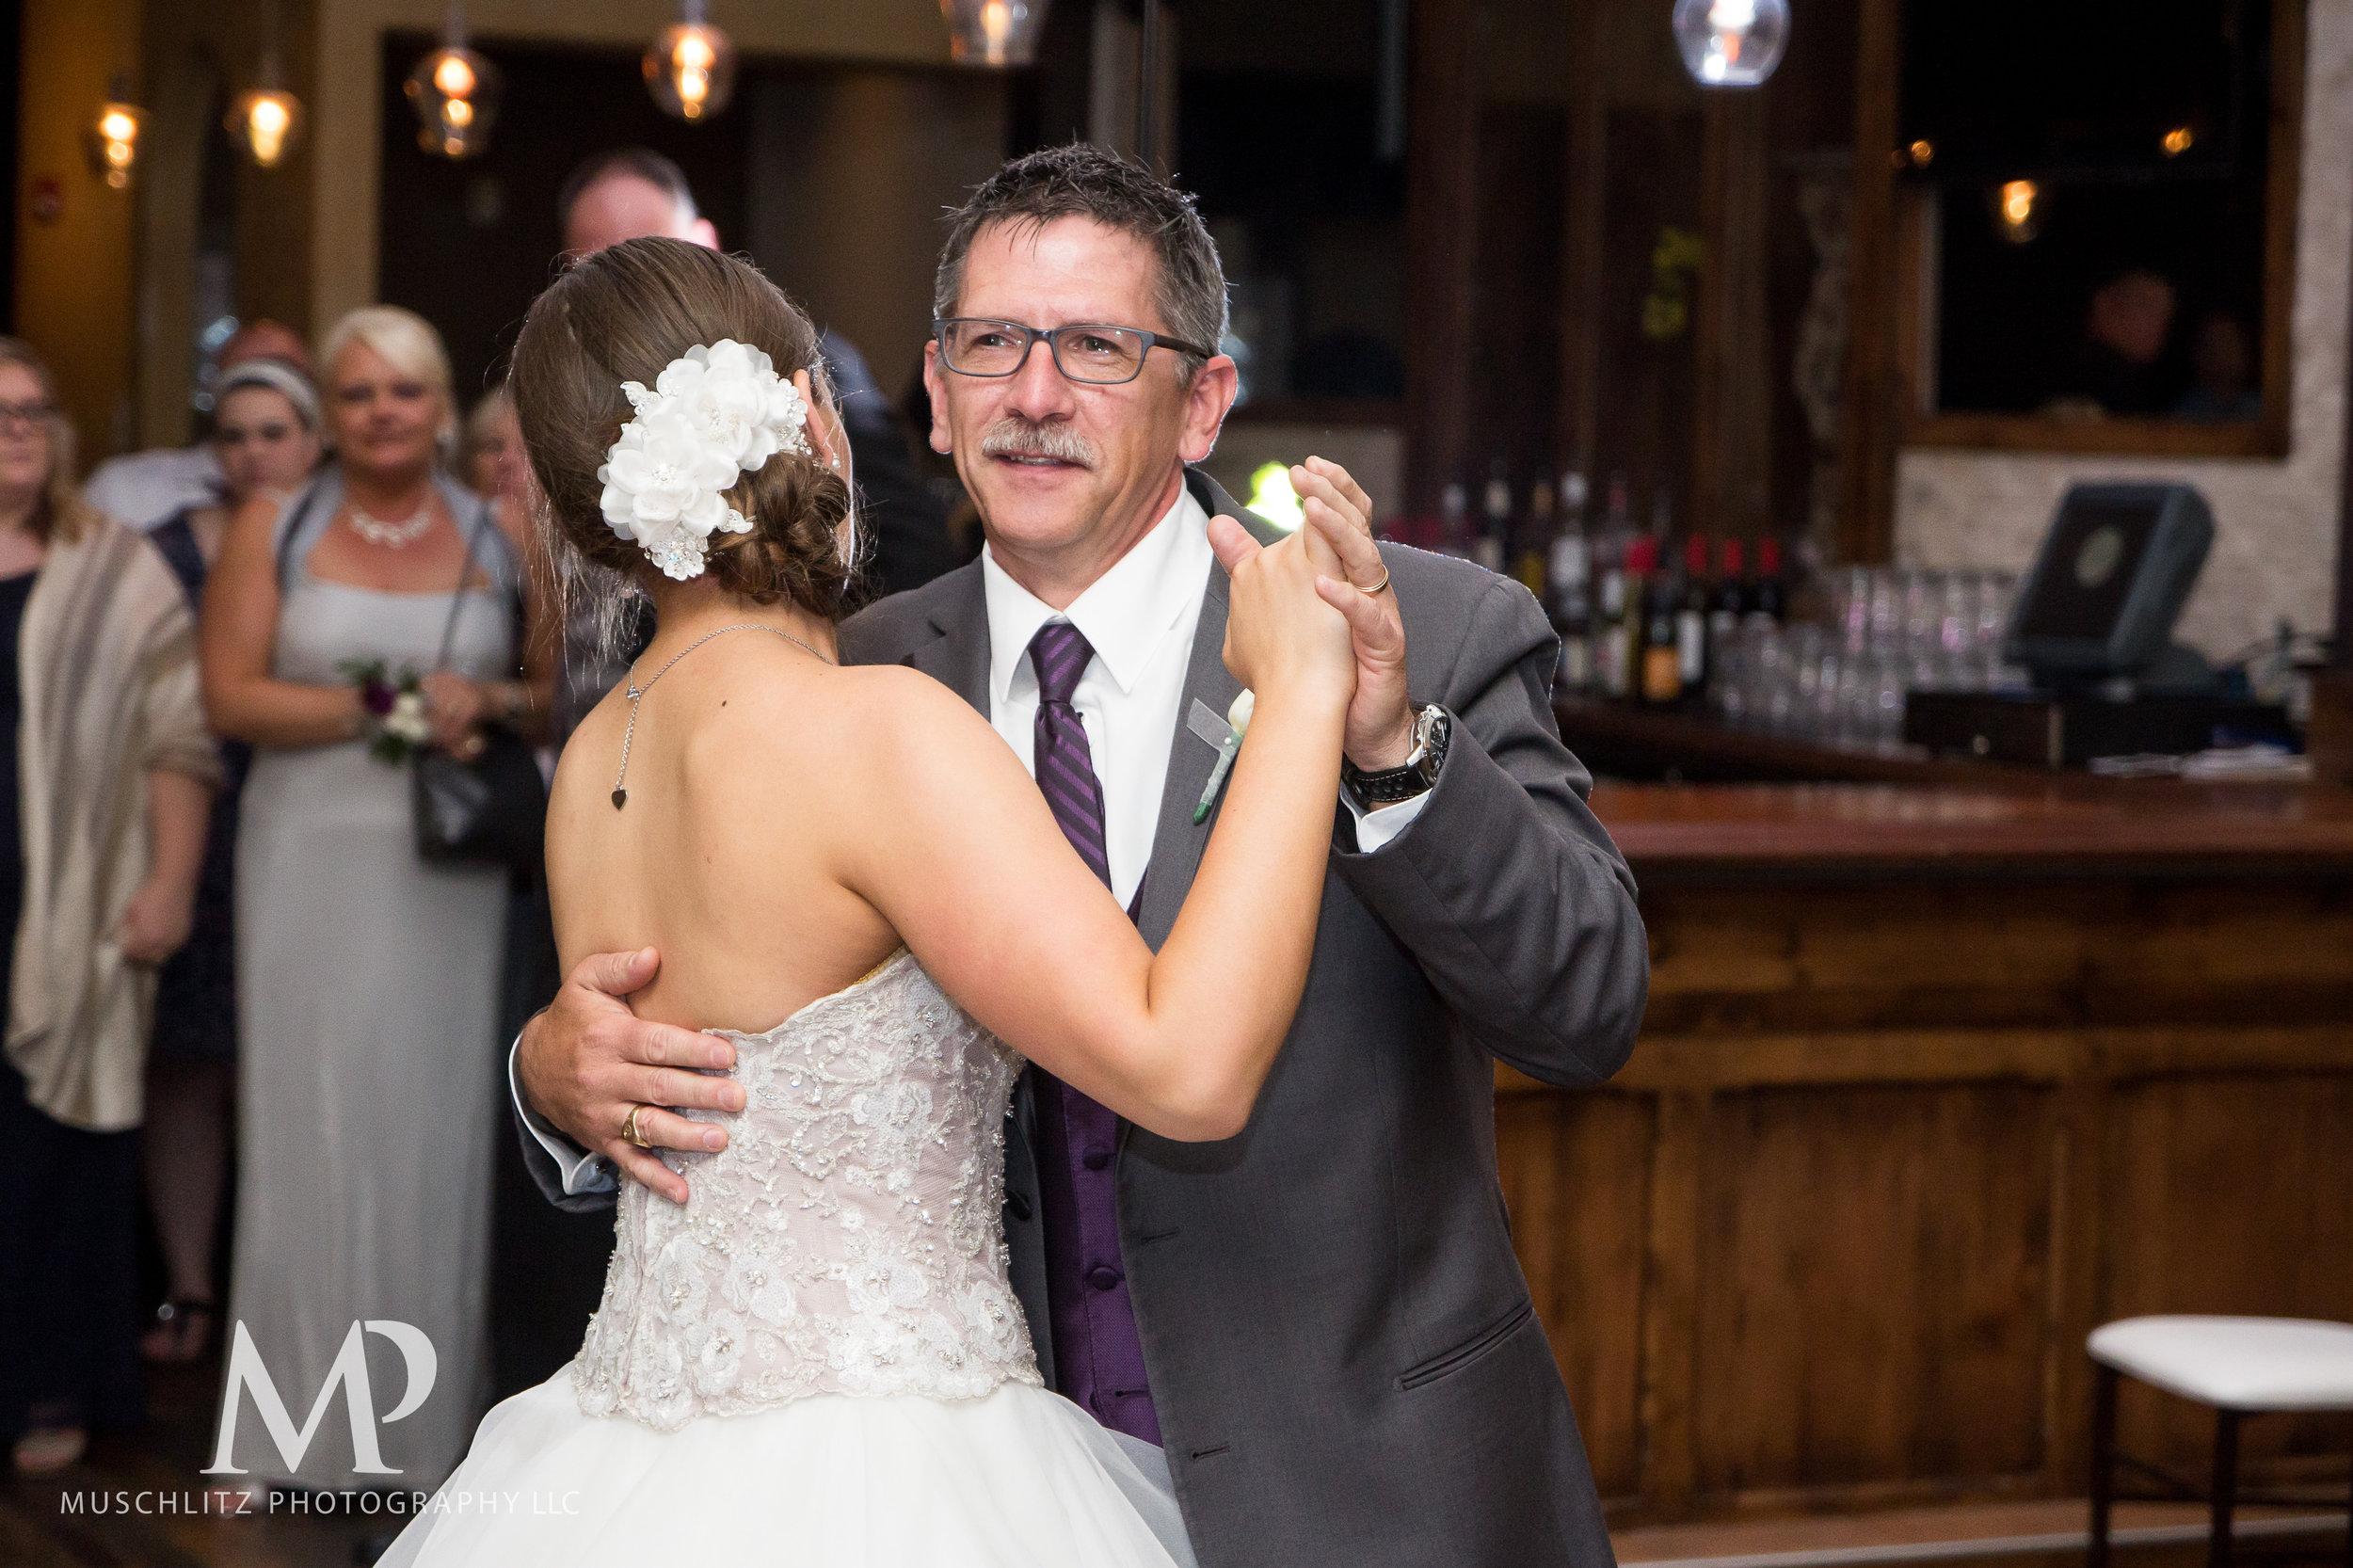 club-at-corazon-wedding-ceremony-reception-columbus-dublin-ohio-ohio-university-theme-084.JPG